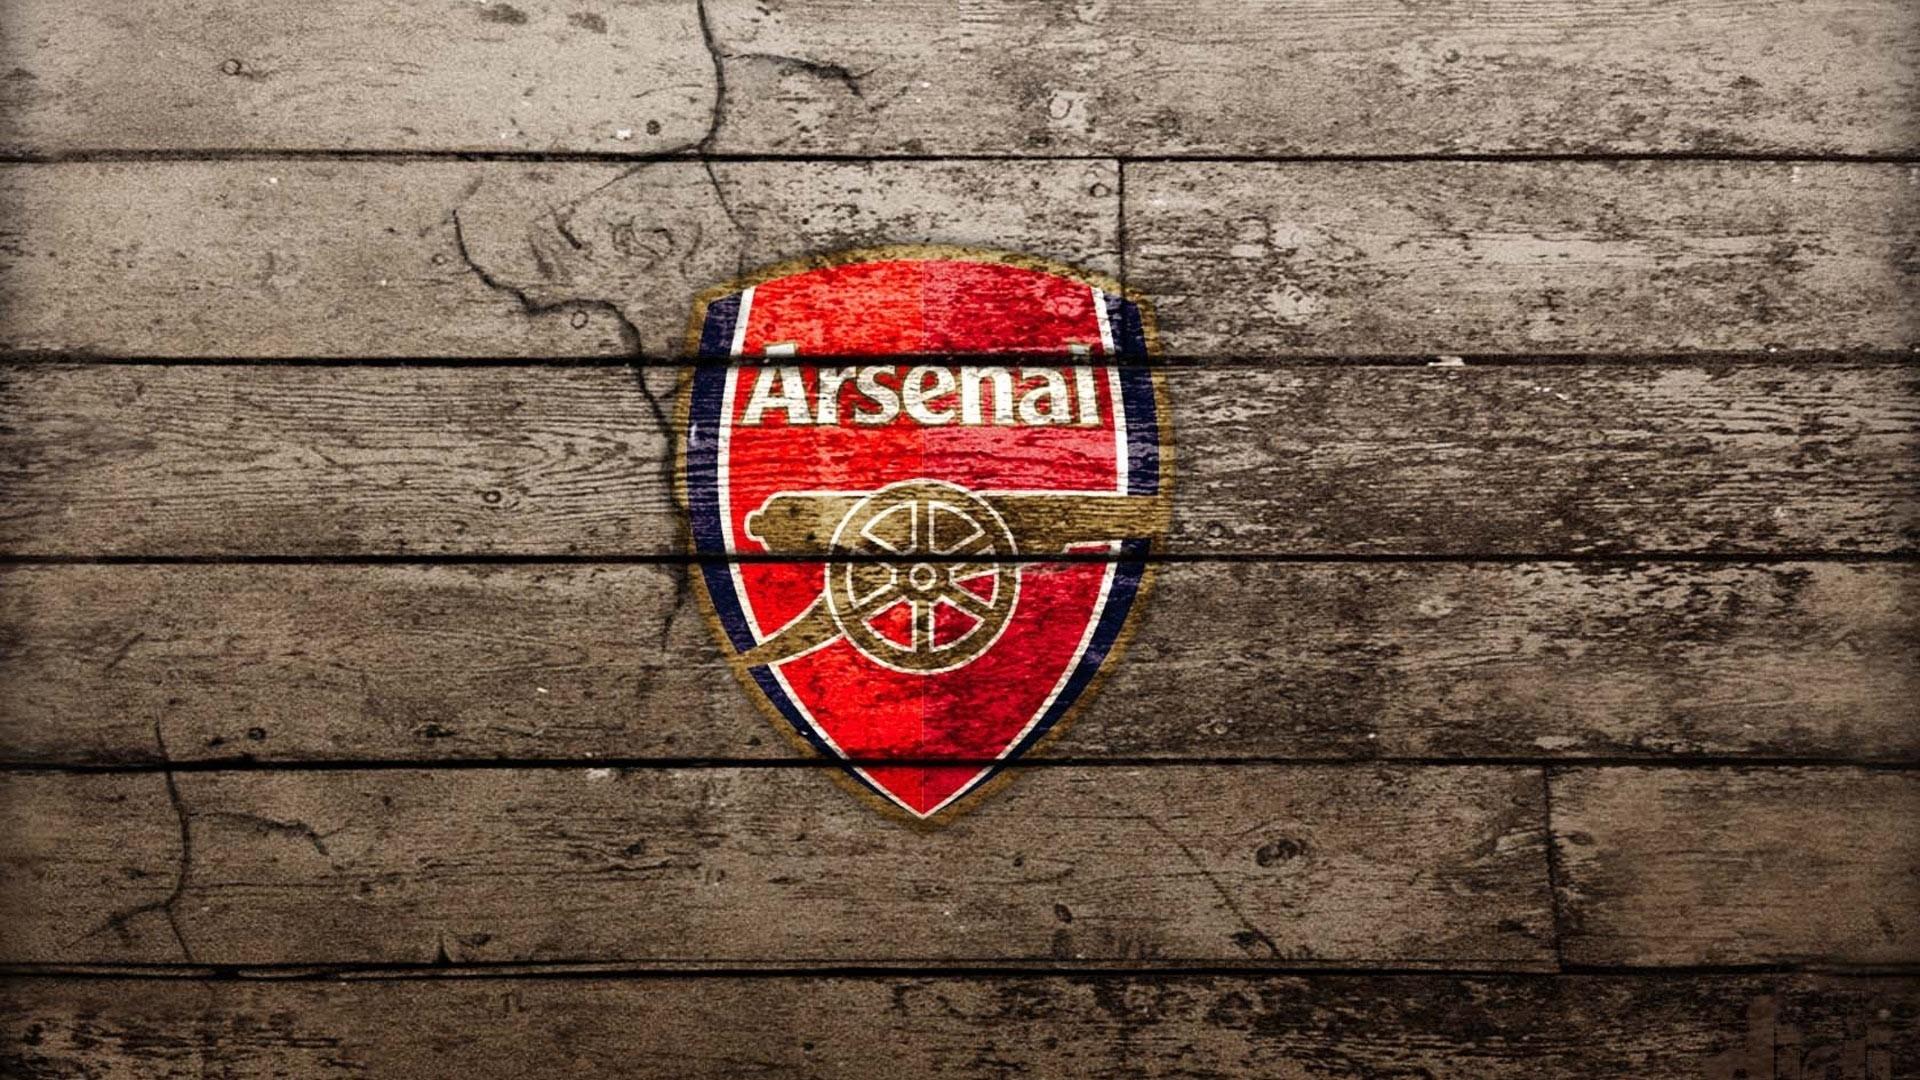 Arsenal Background Wallpaper